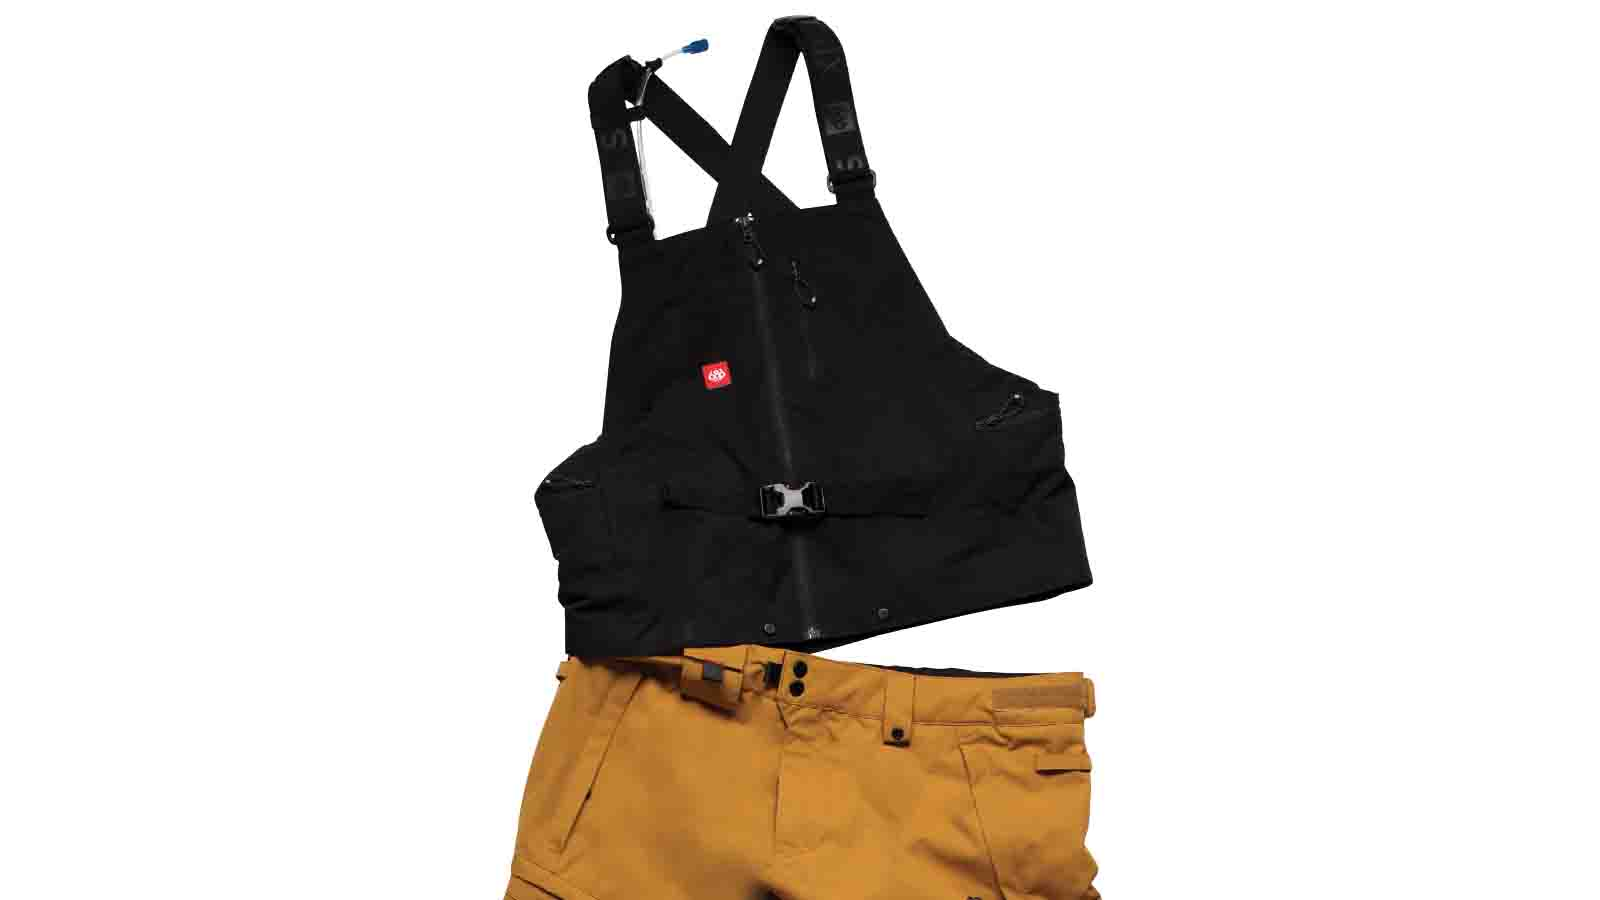 686 21/22 Men's Outerwear